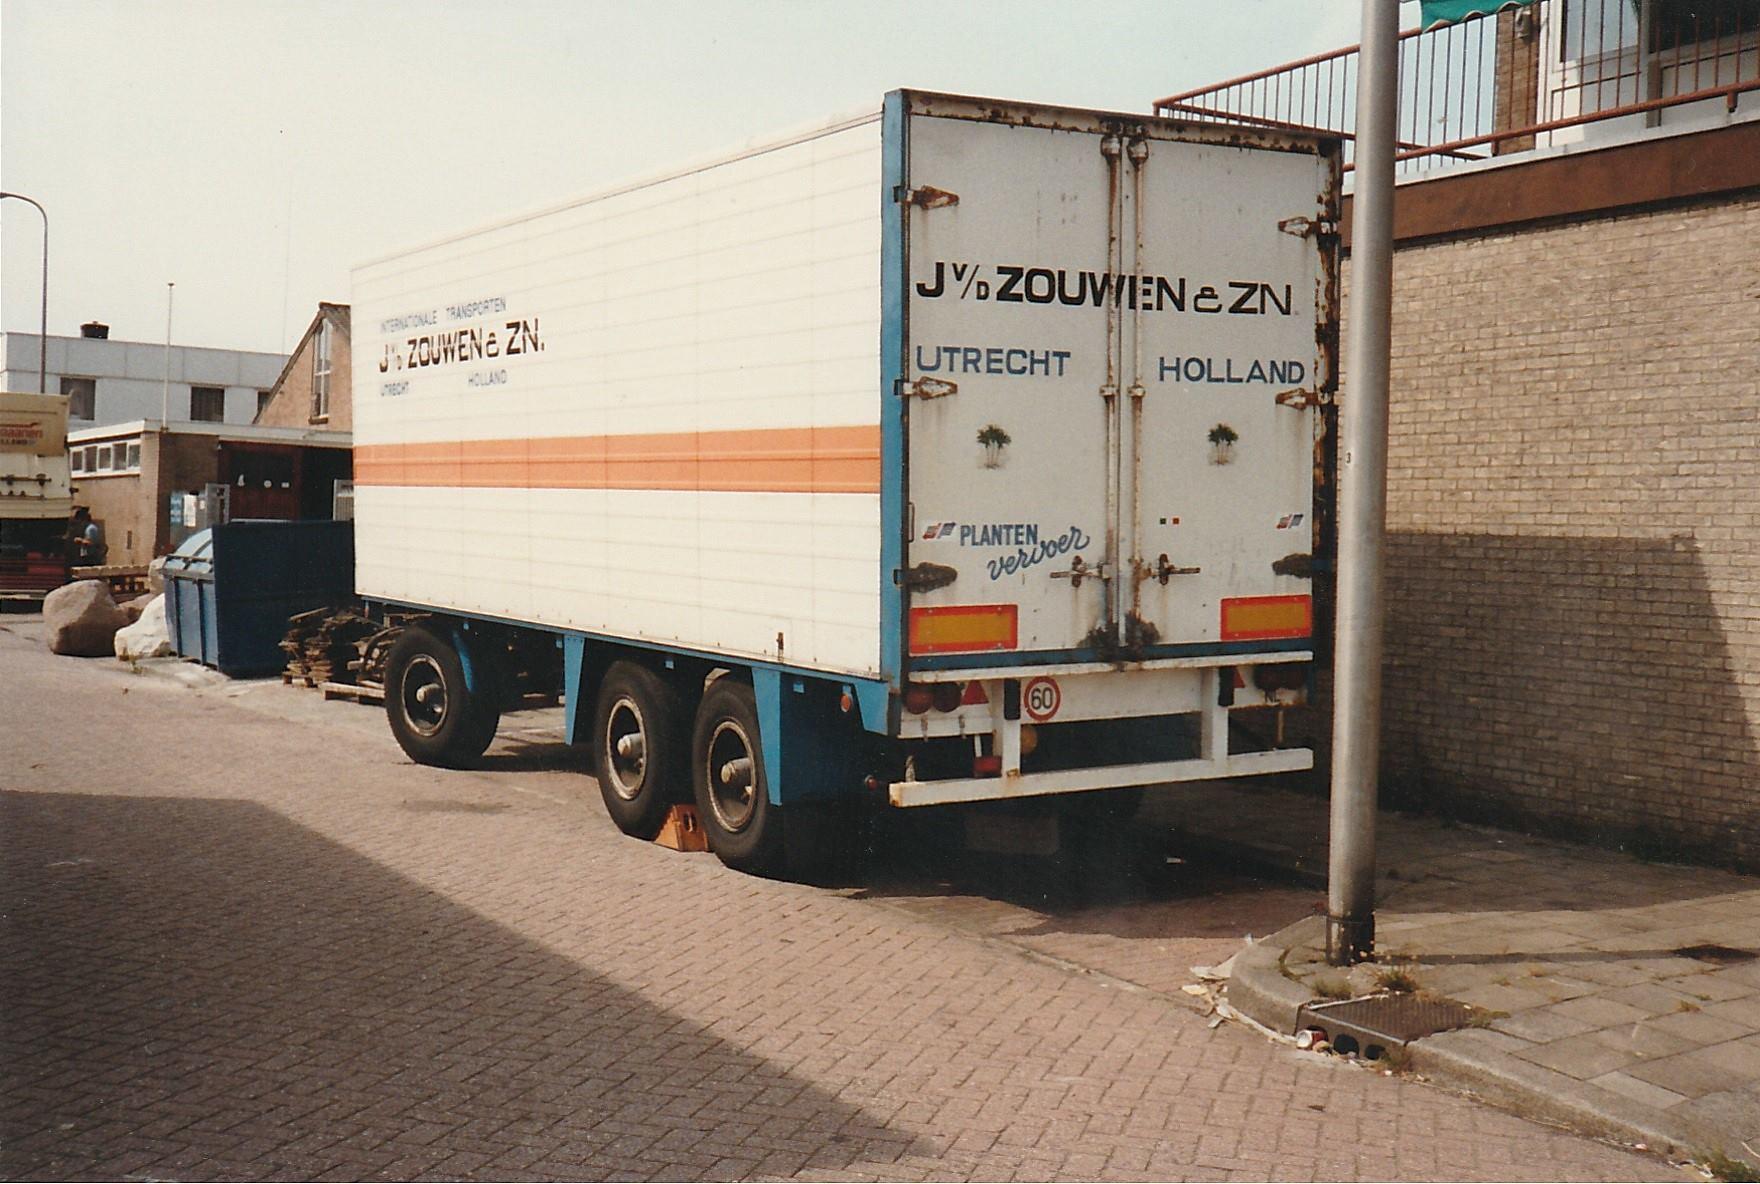 Bas-van-der-Zouwen-foto-archief-(34)